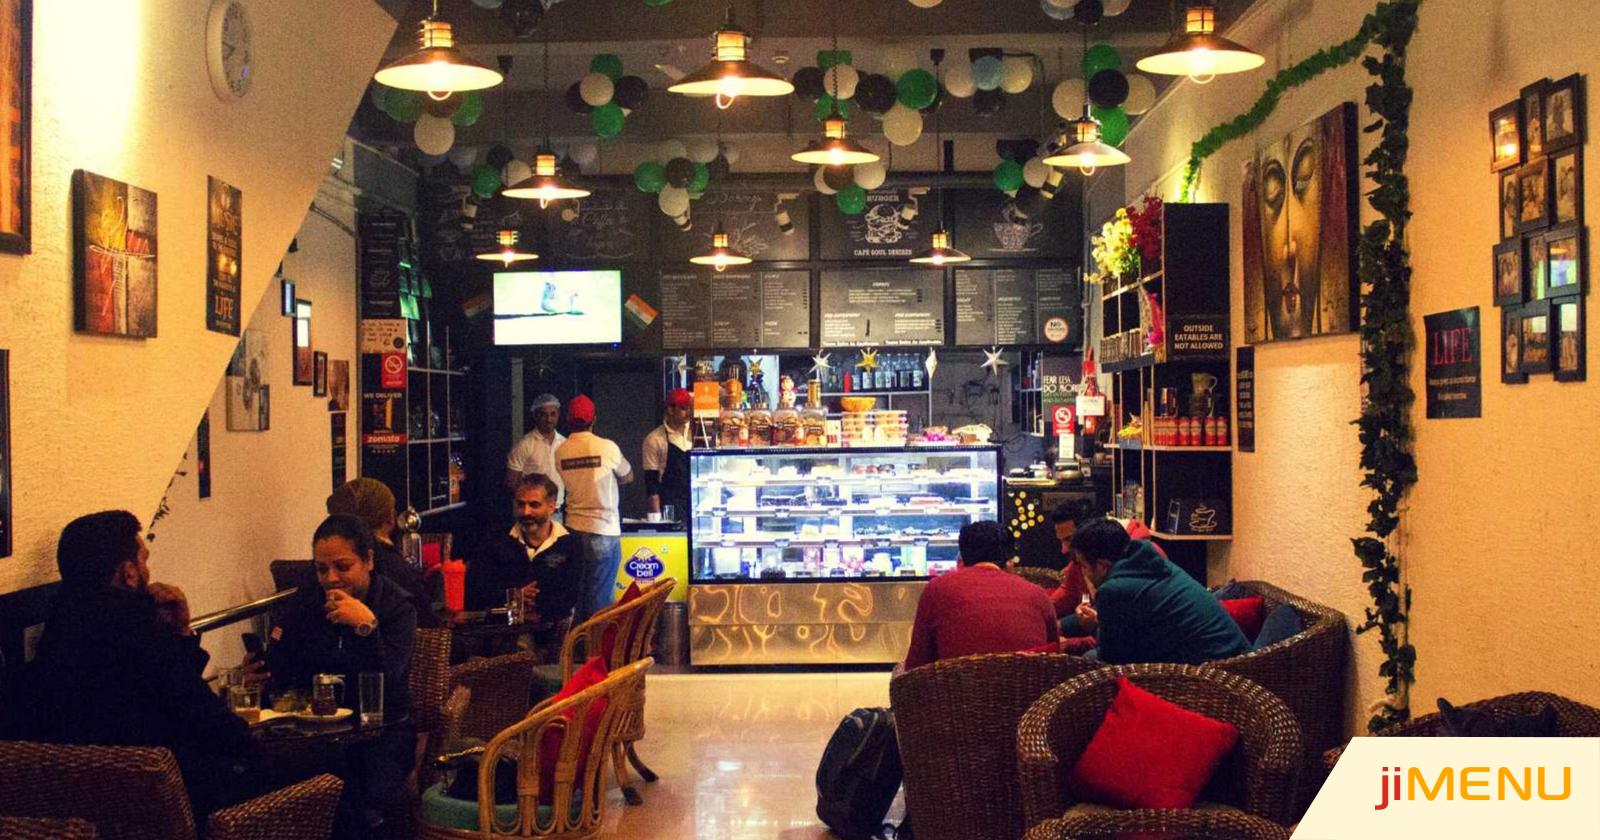 Cafe Souls Desires' Transforms its Restaurant Menu with jiMenu POS